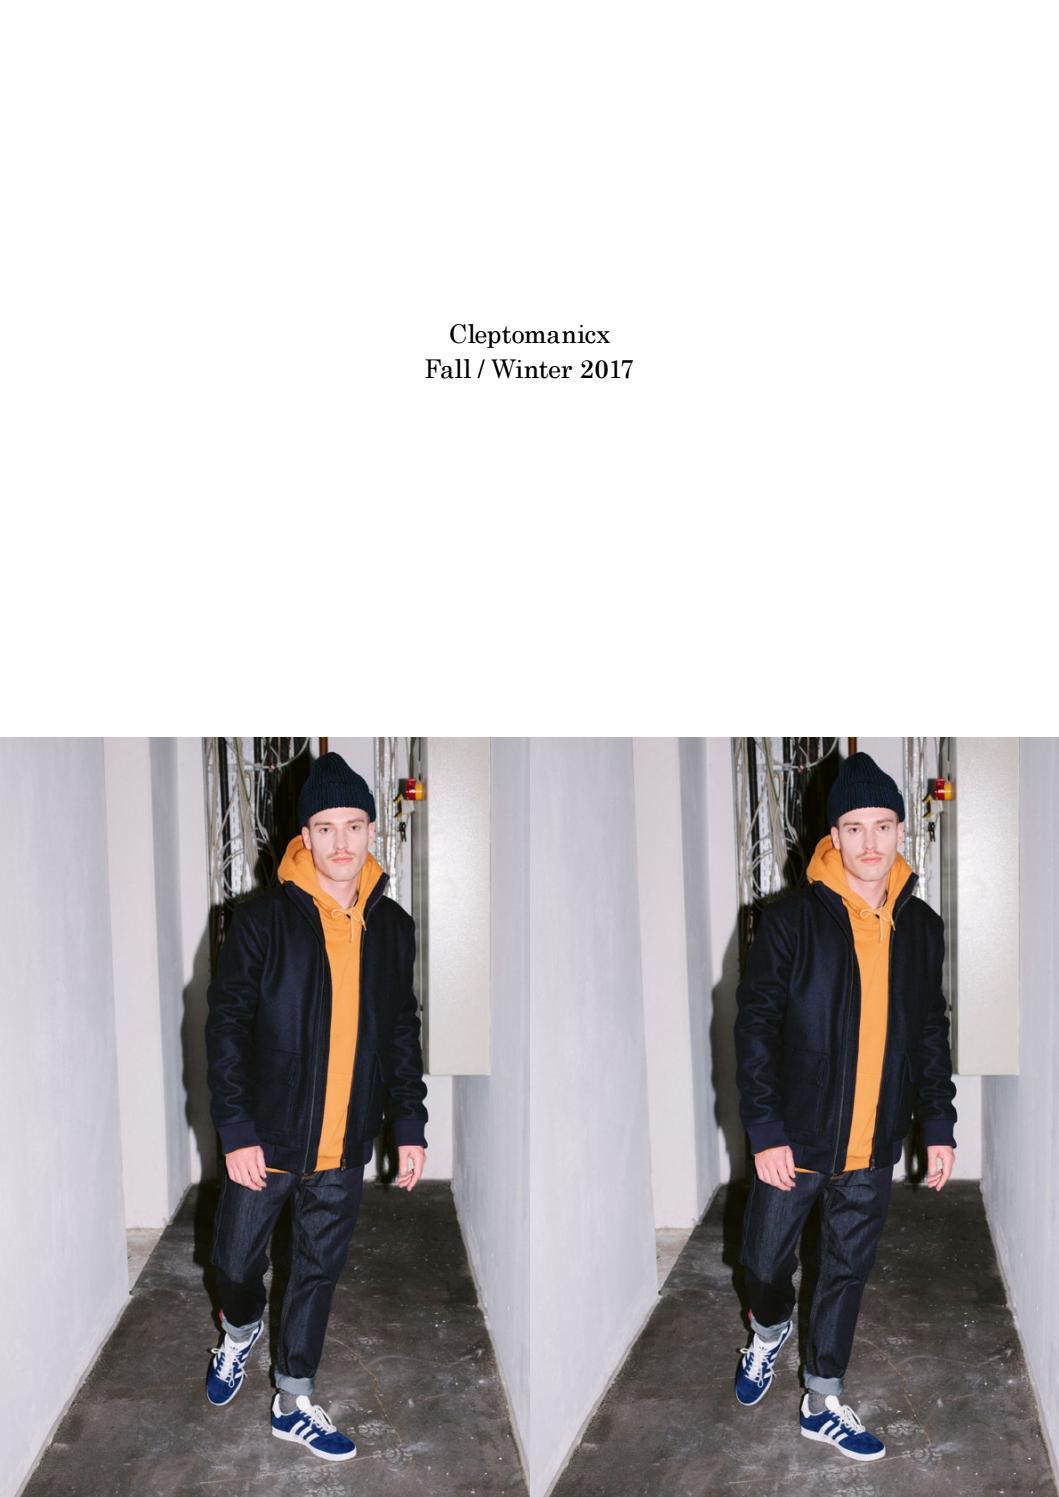 CLEPTOMANICX CITYPE MJ BLUE CREWNECK T-SHIRT